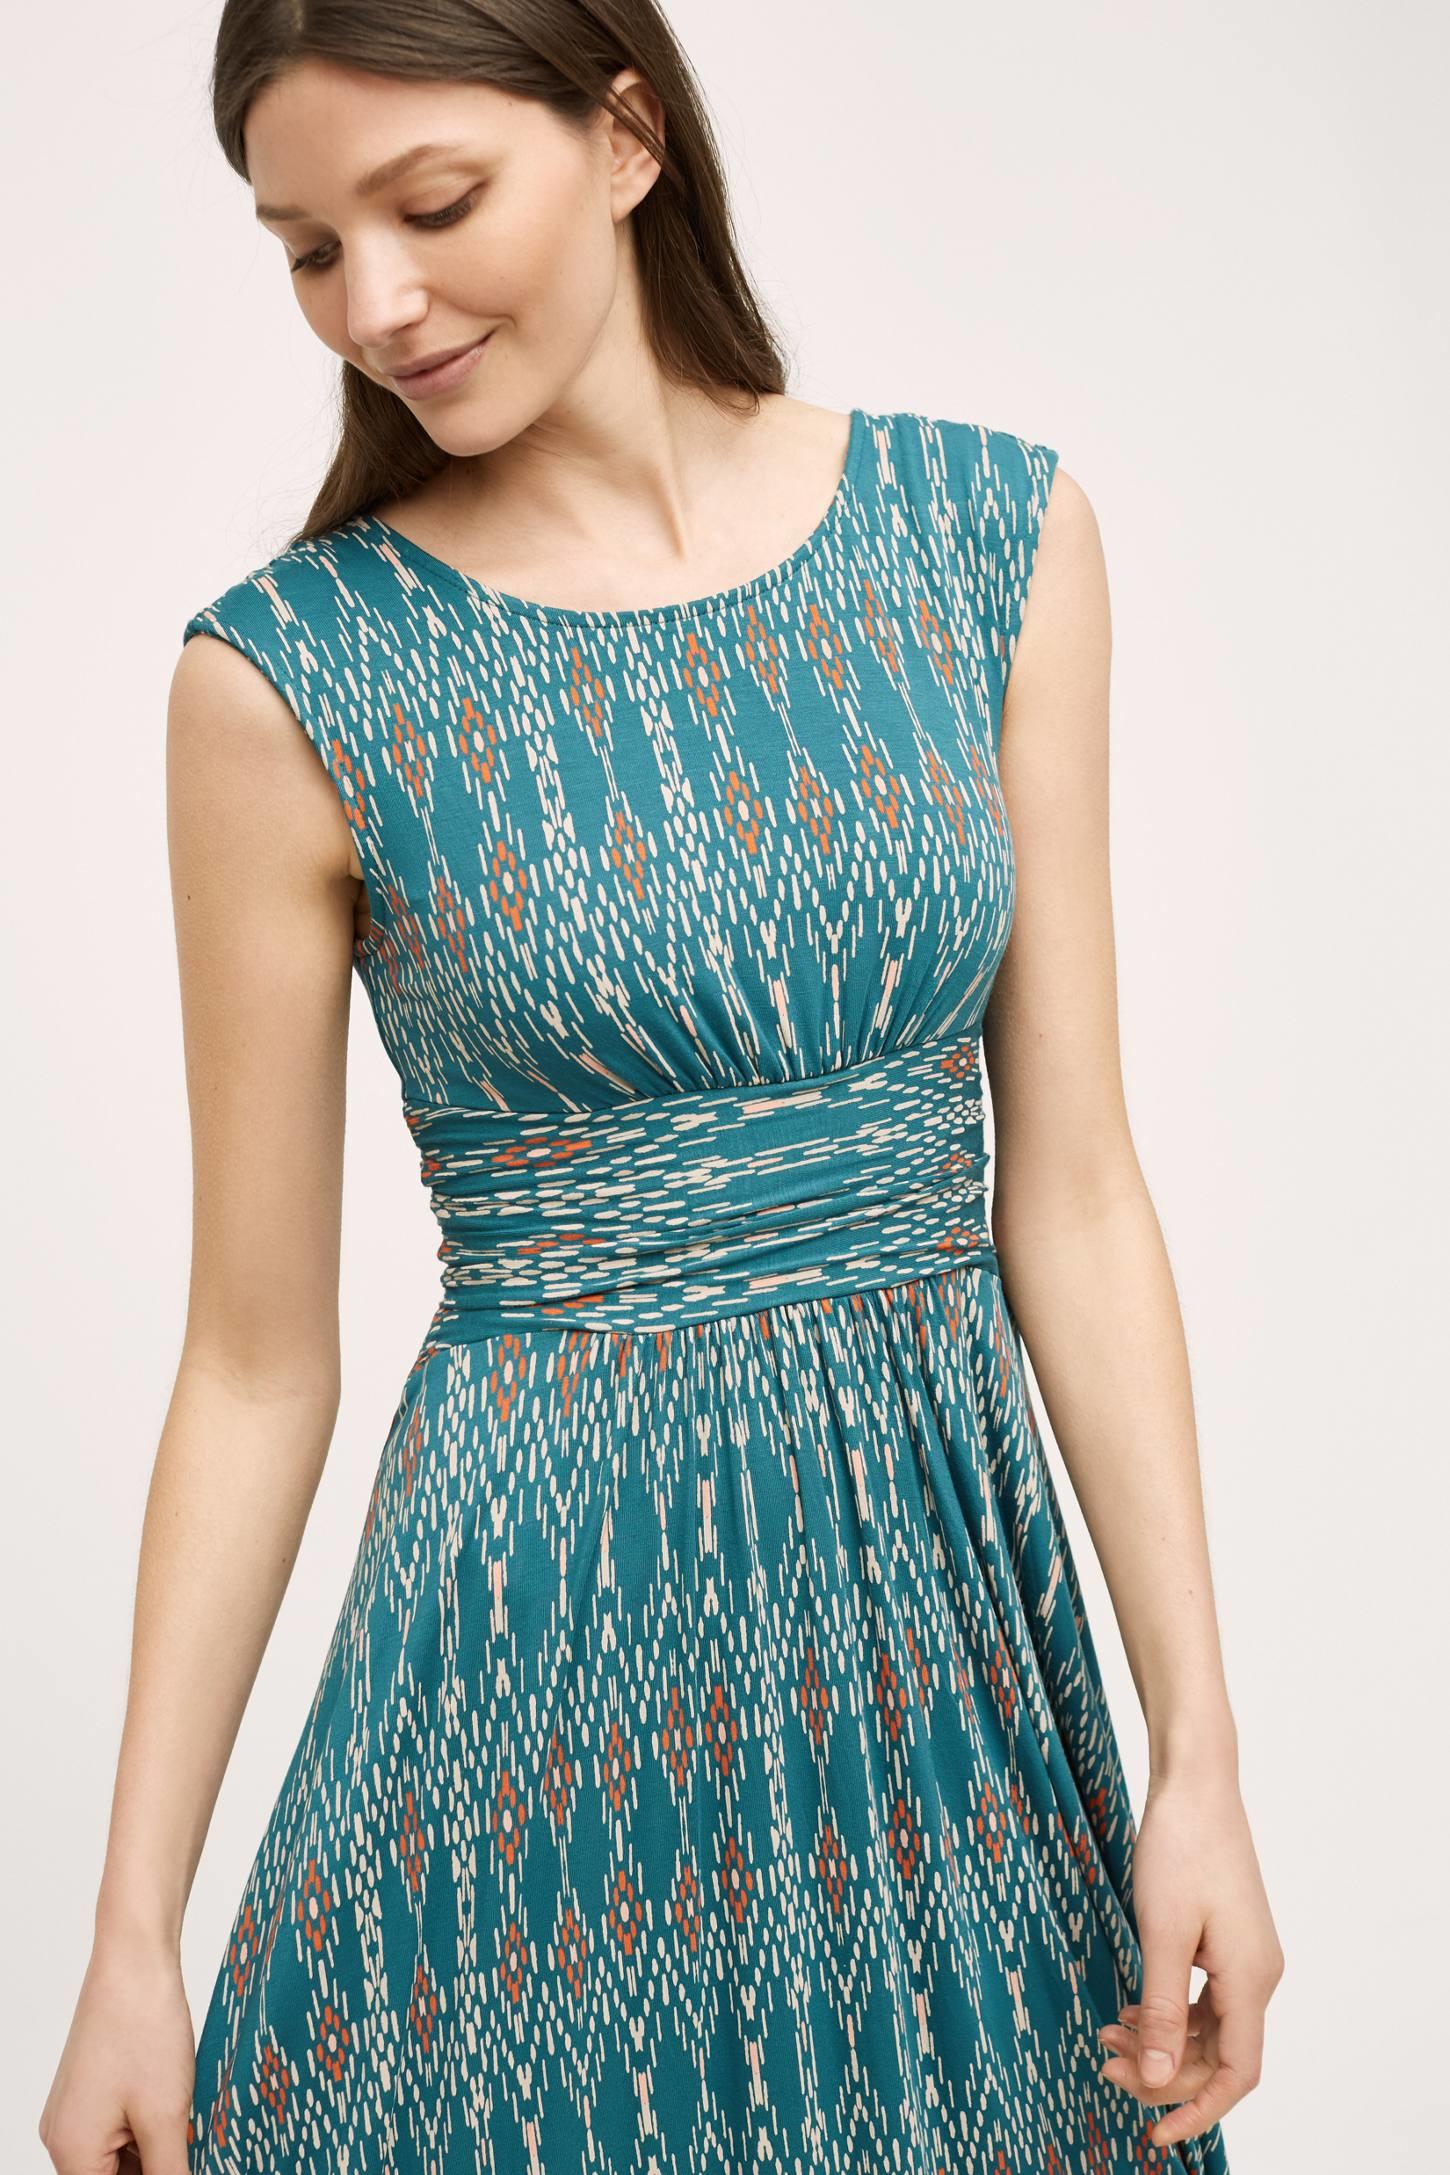 Lyst - Maeve Mallorca Maxi Dress in Blue